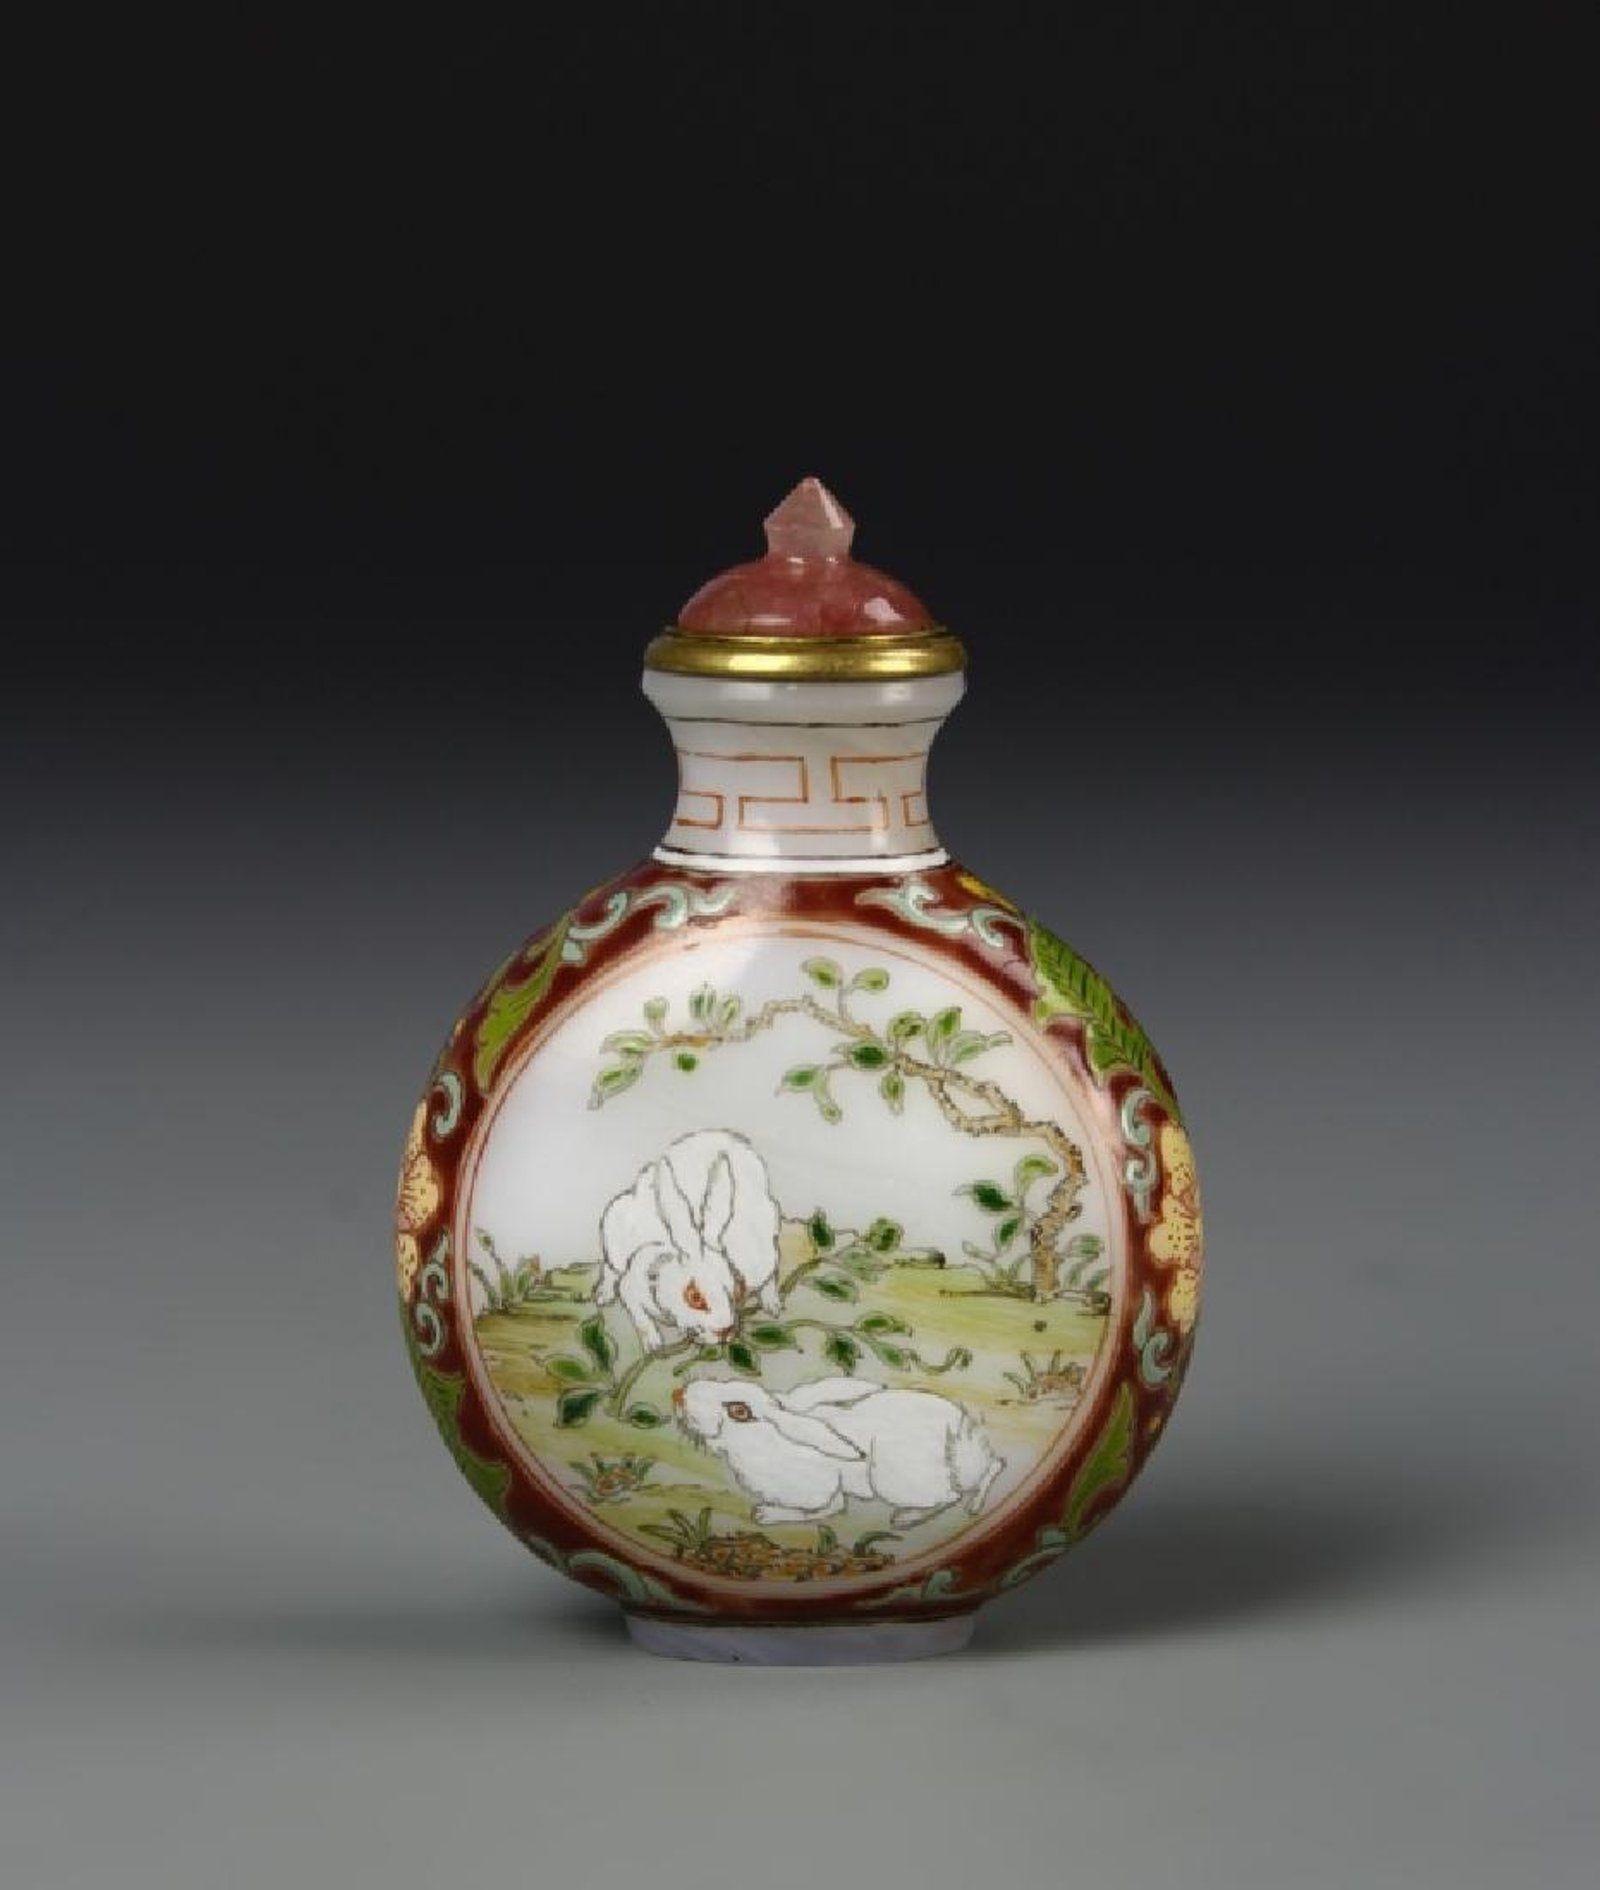 large wine glass vase of 10 new what to put in a large glass vase bogekompresorturkiye com regarding chinese peking glass snuff bottle